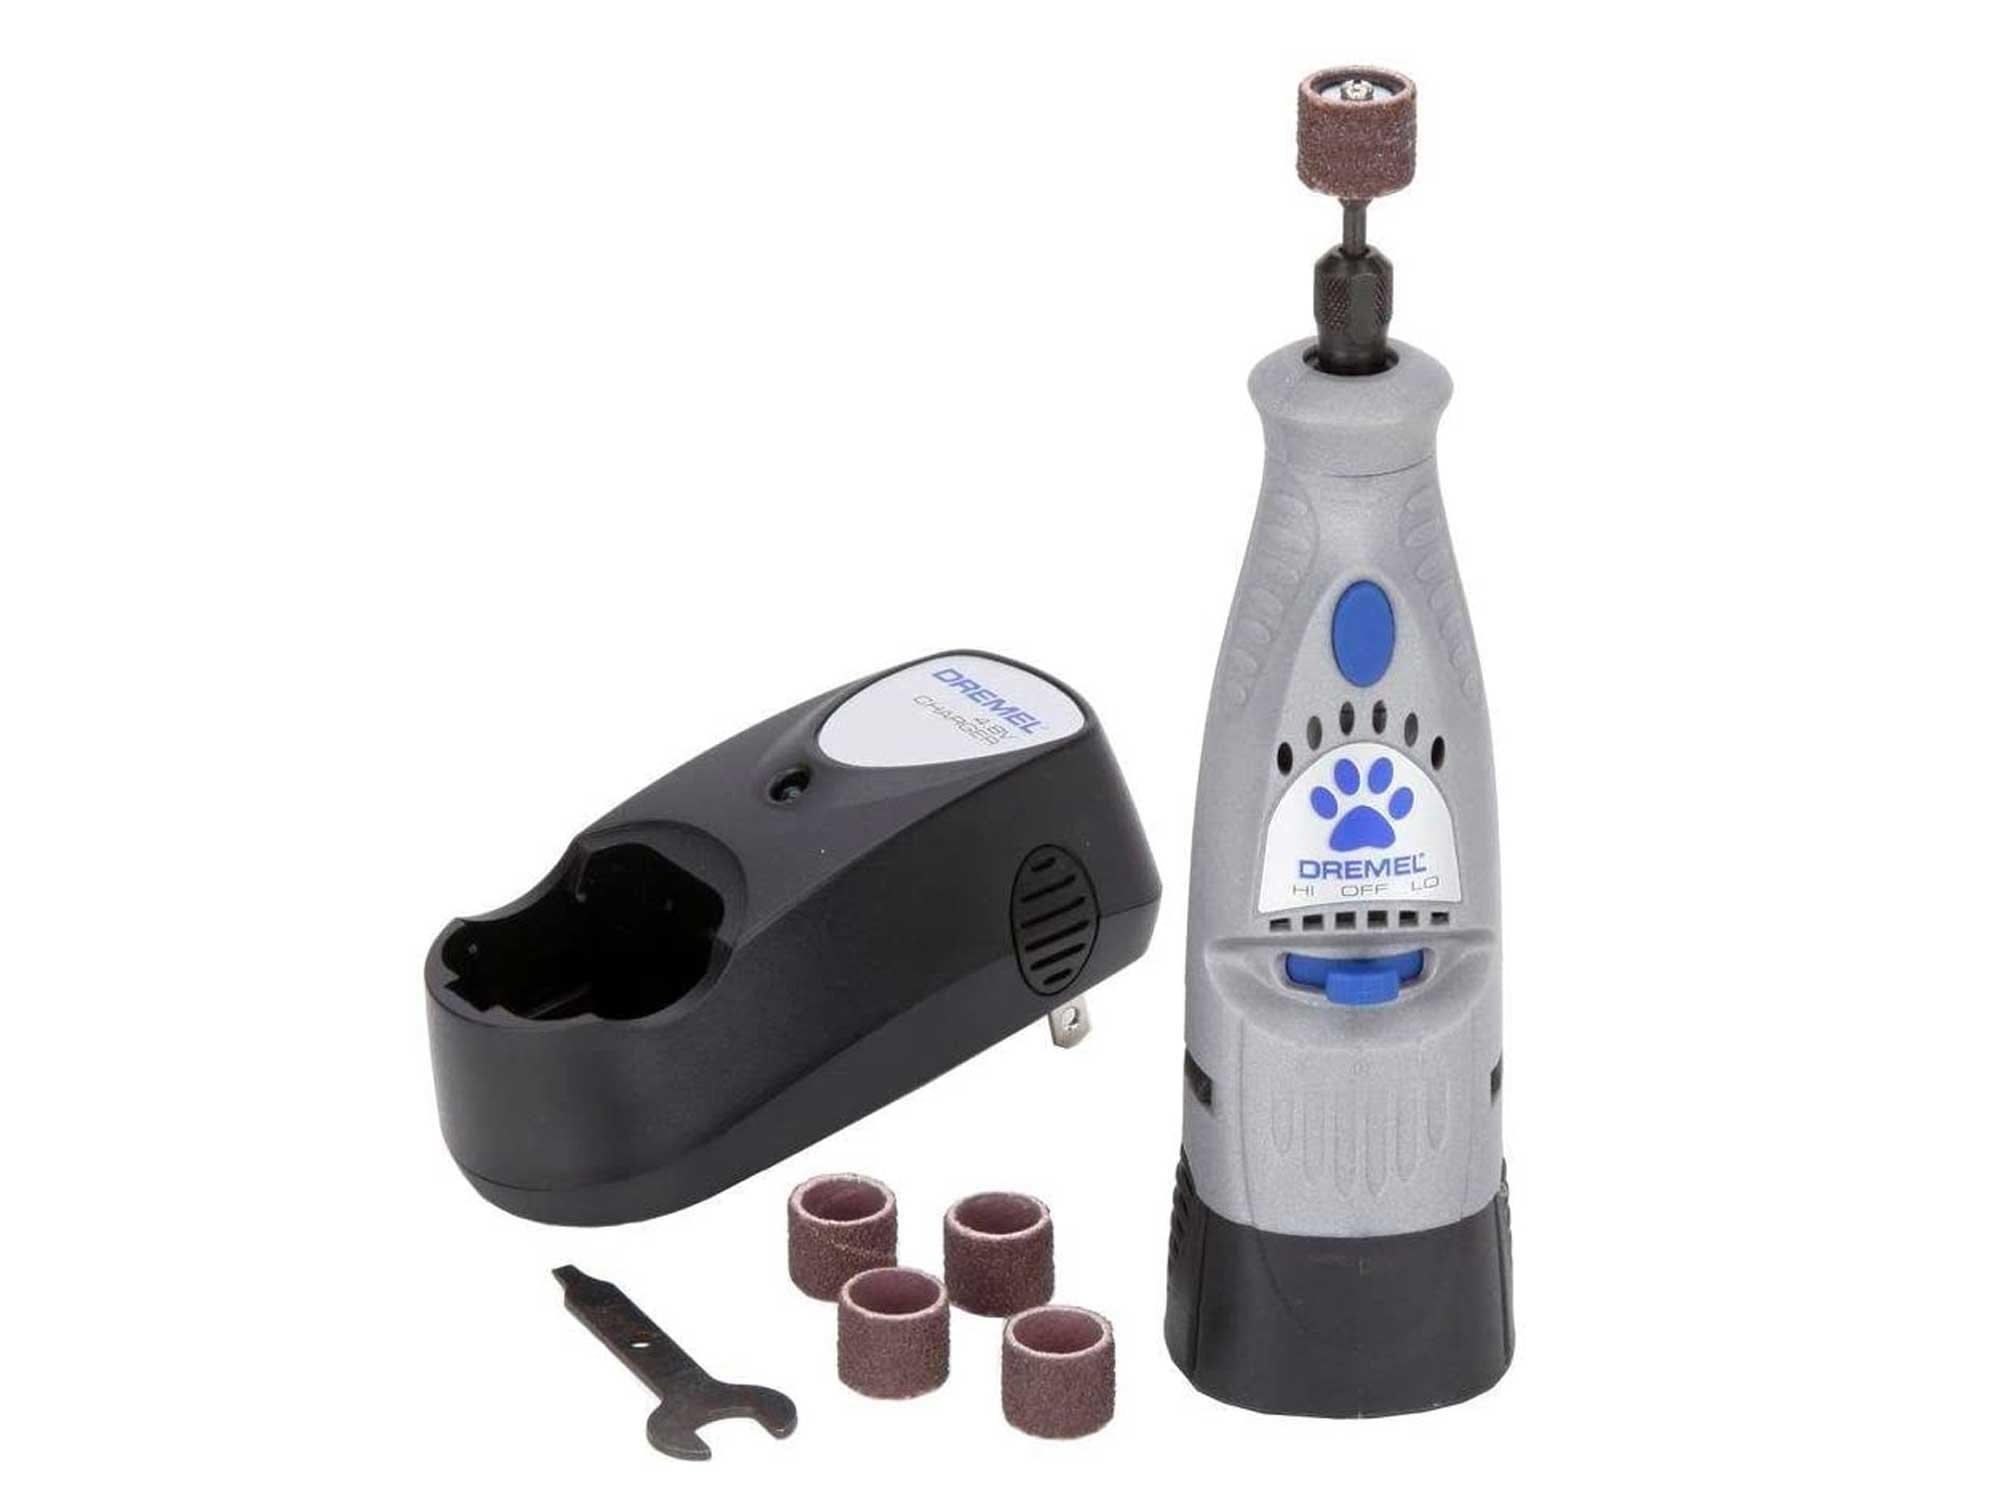 Dremel 4.8V Cordless Pet Dog Nail Grooming & Grinding Tool, Safely & Humanely Trim Pet & Dog Nails, Grey